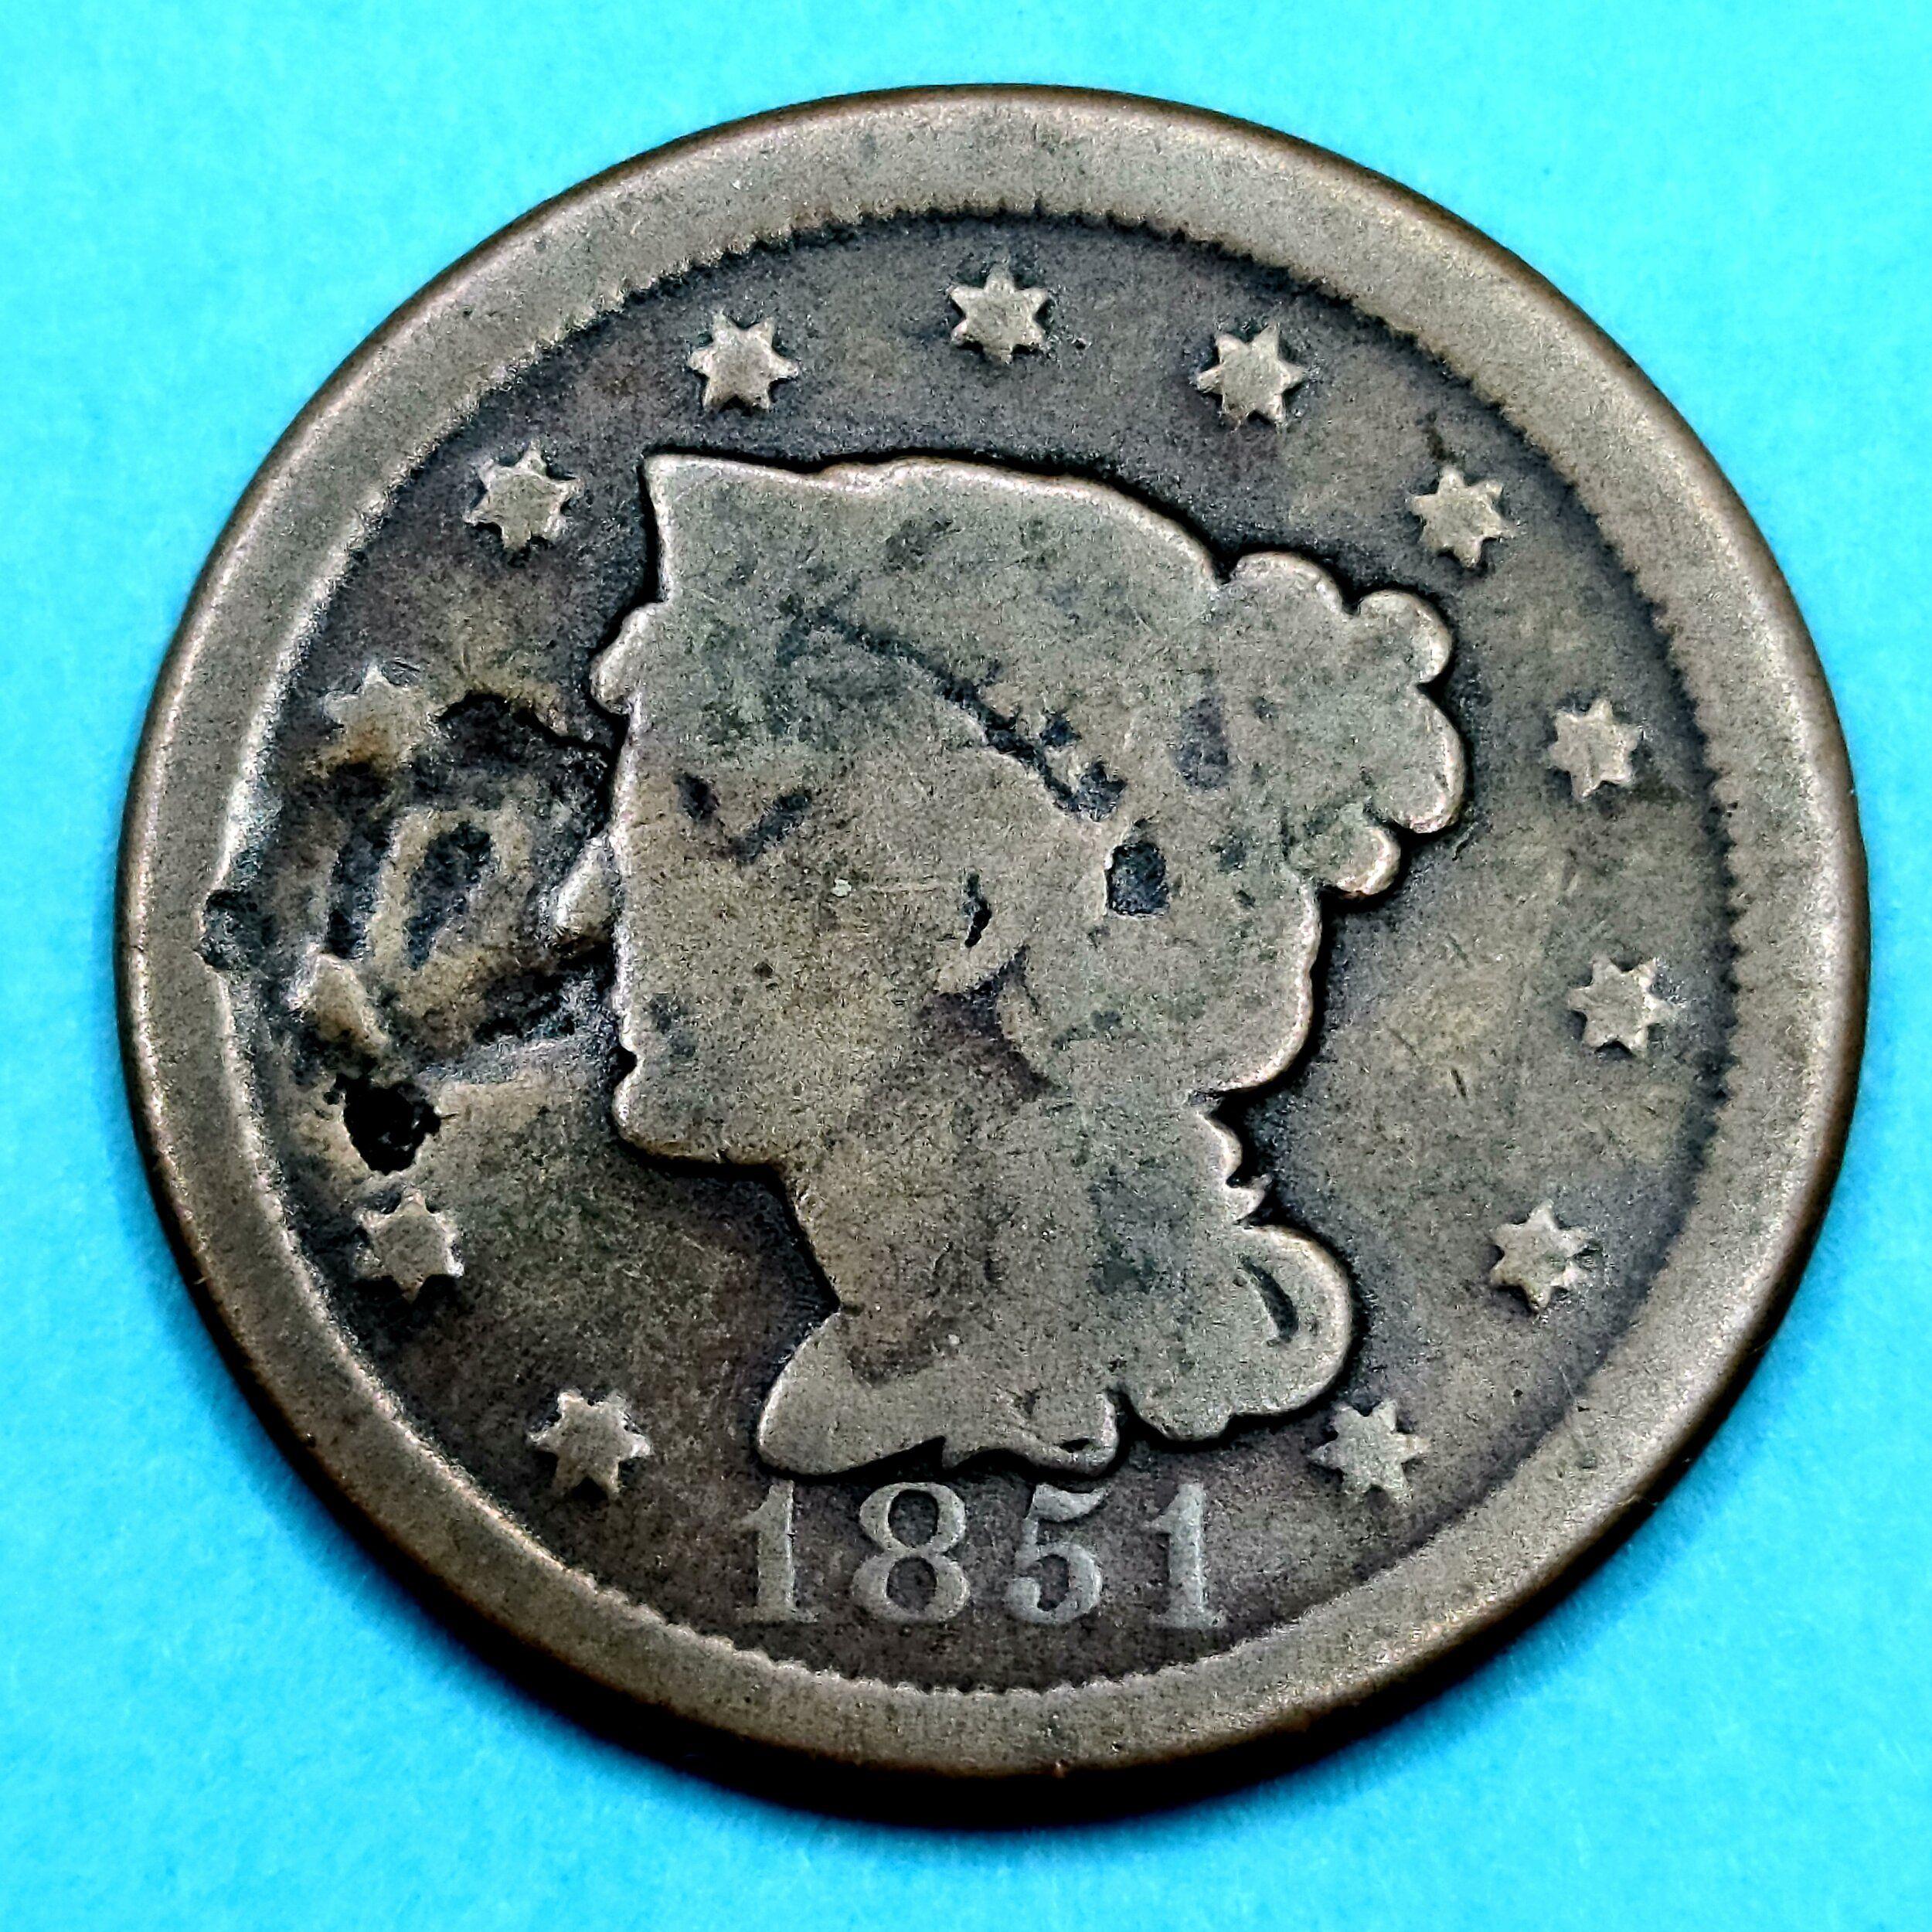 1851 U S Braided Hair Large One Cent 1851 U S Braided Hair Large One Cent Braided Hairstyles Braids Coinage